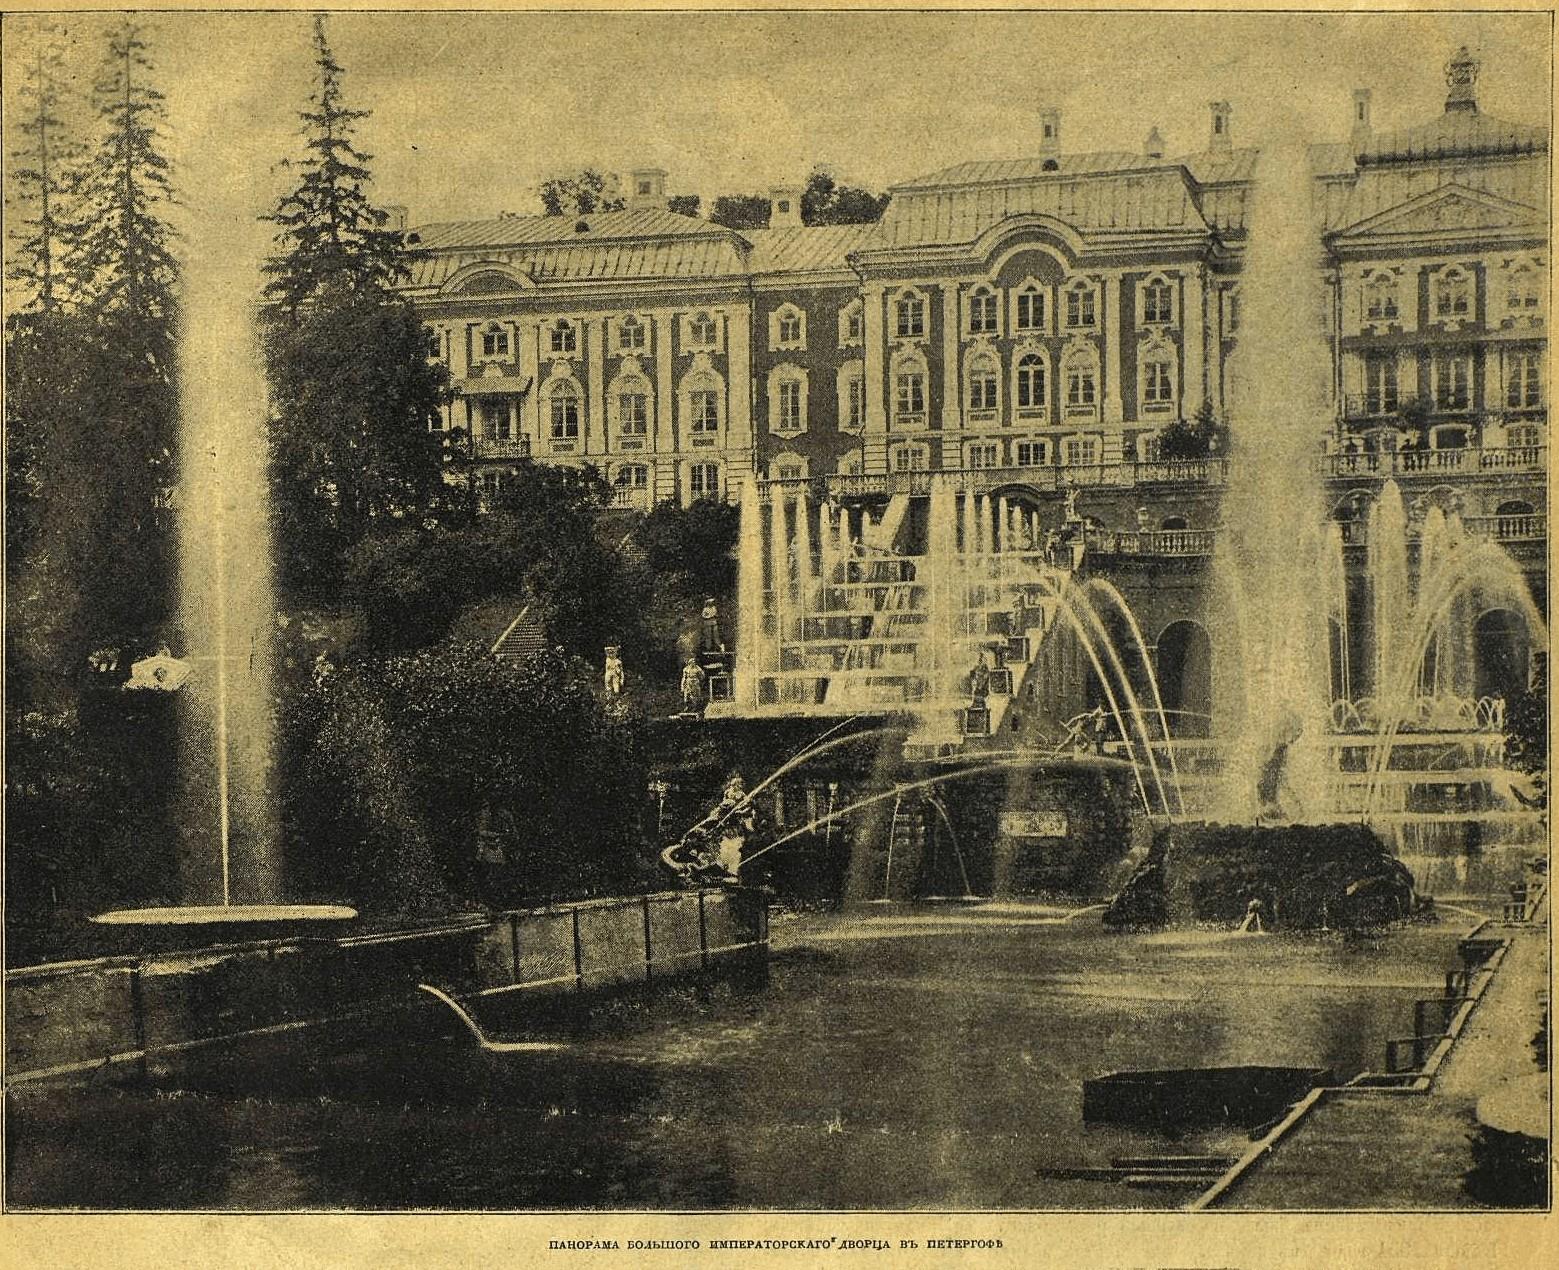 Панорама Большого Императорского дворца.jpg